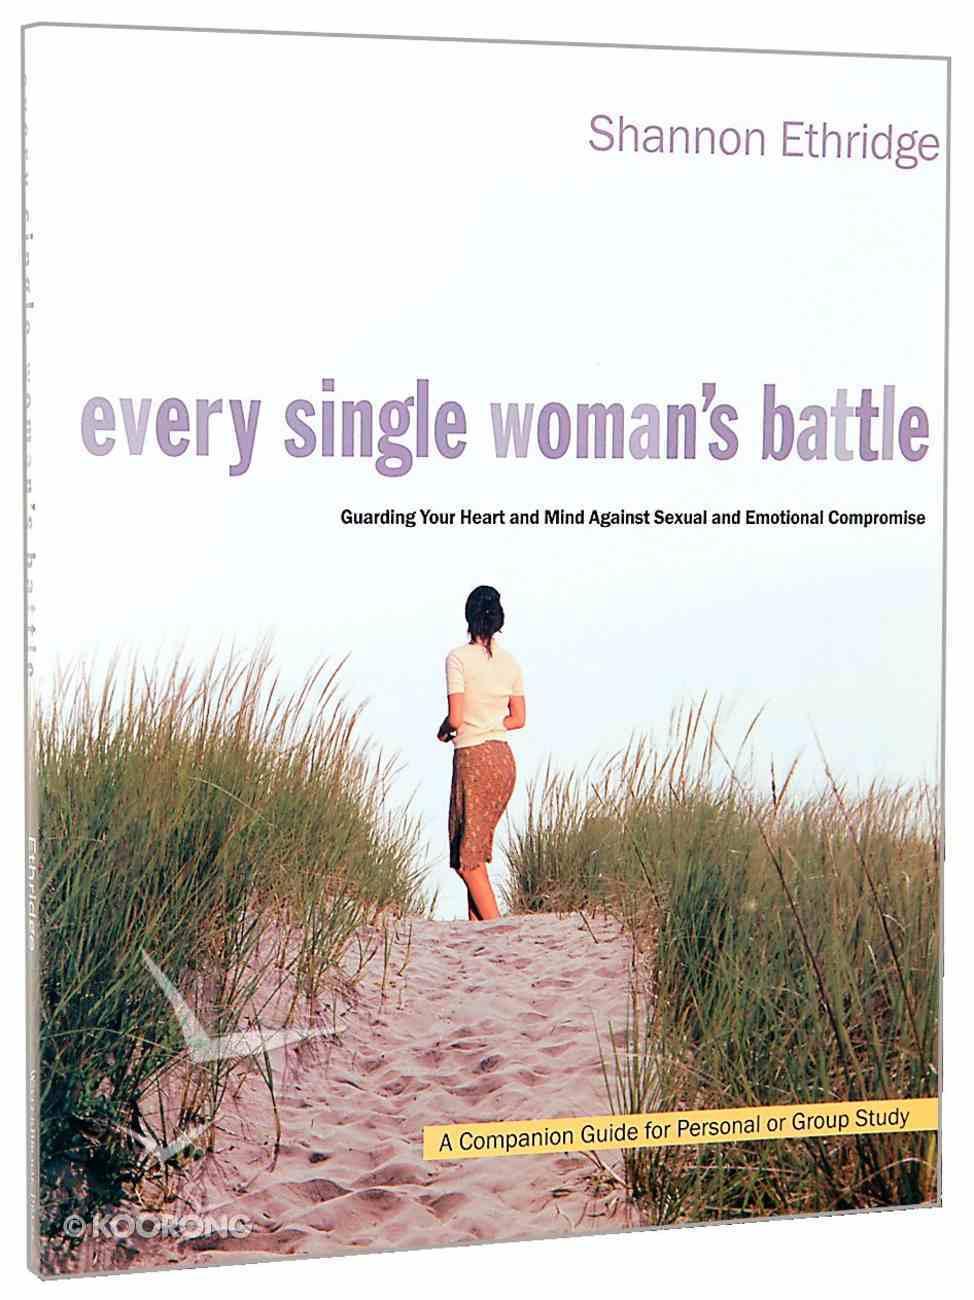 Every Single Woman's Battle Workbook Paperback